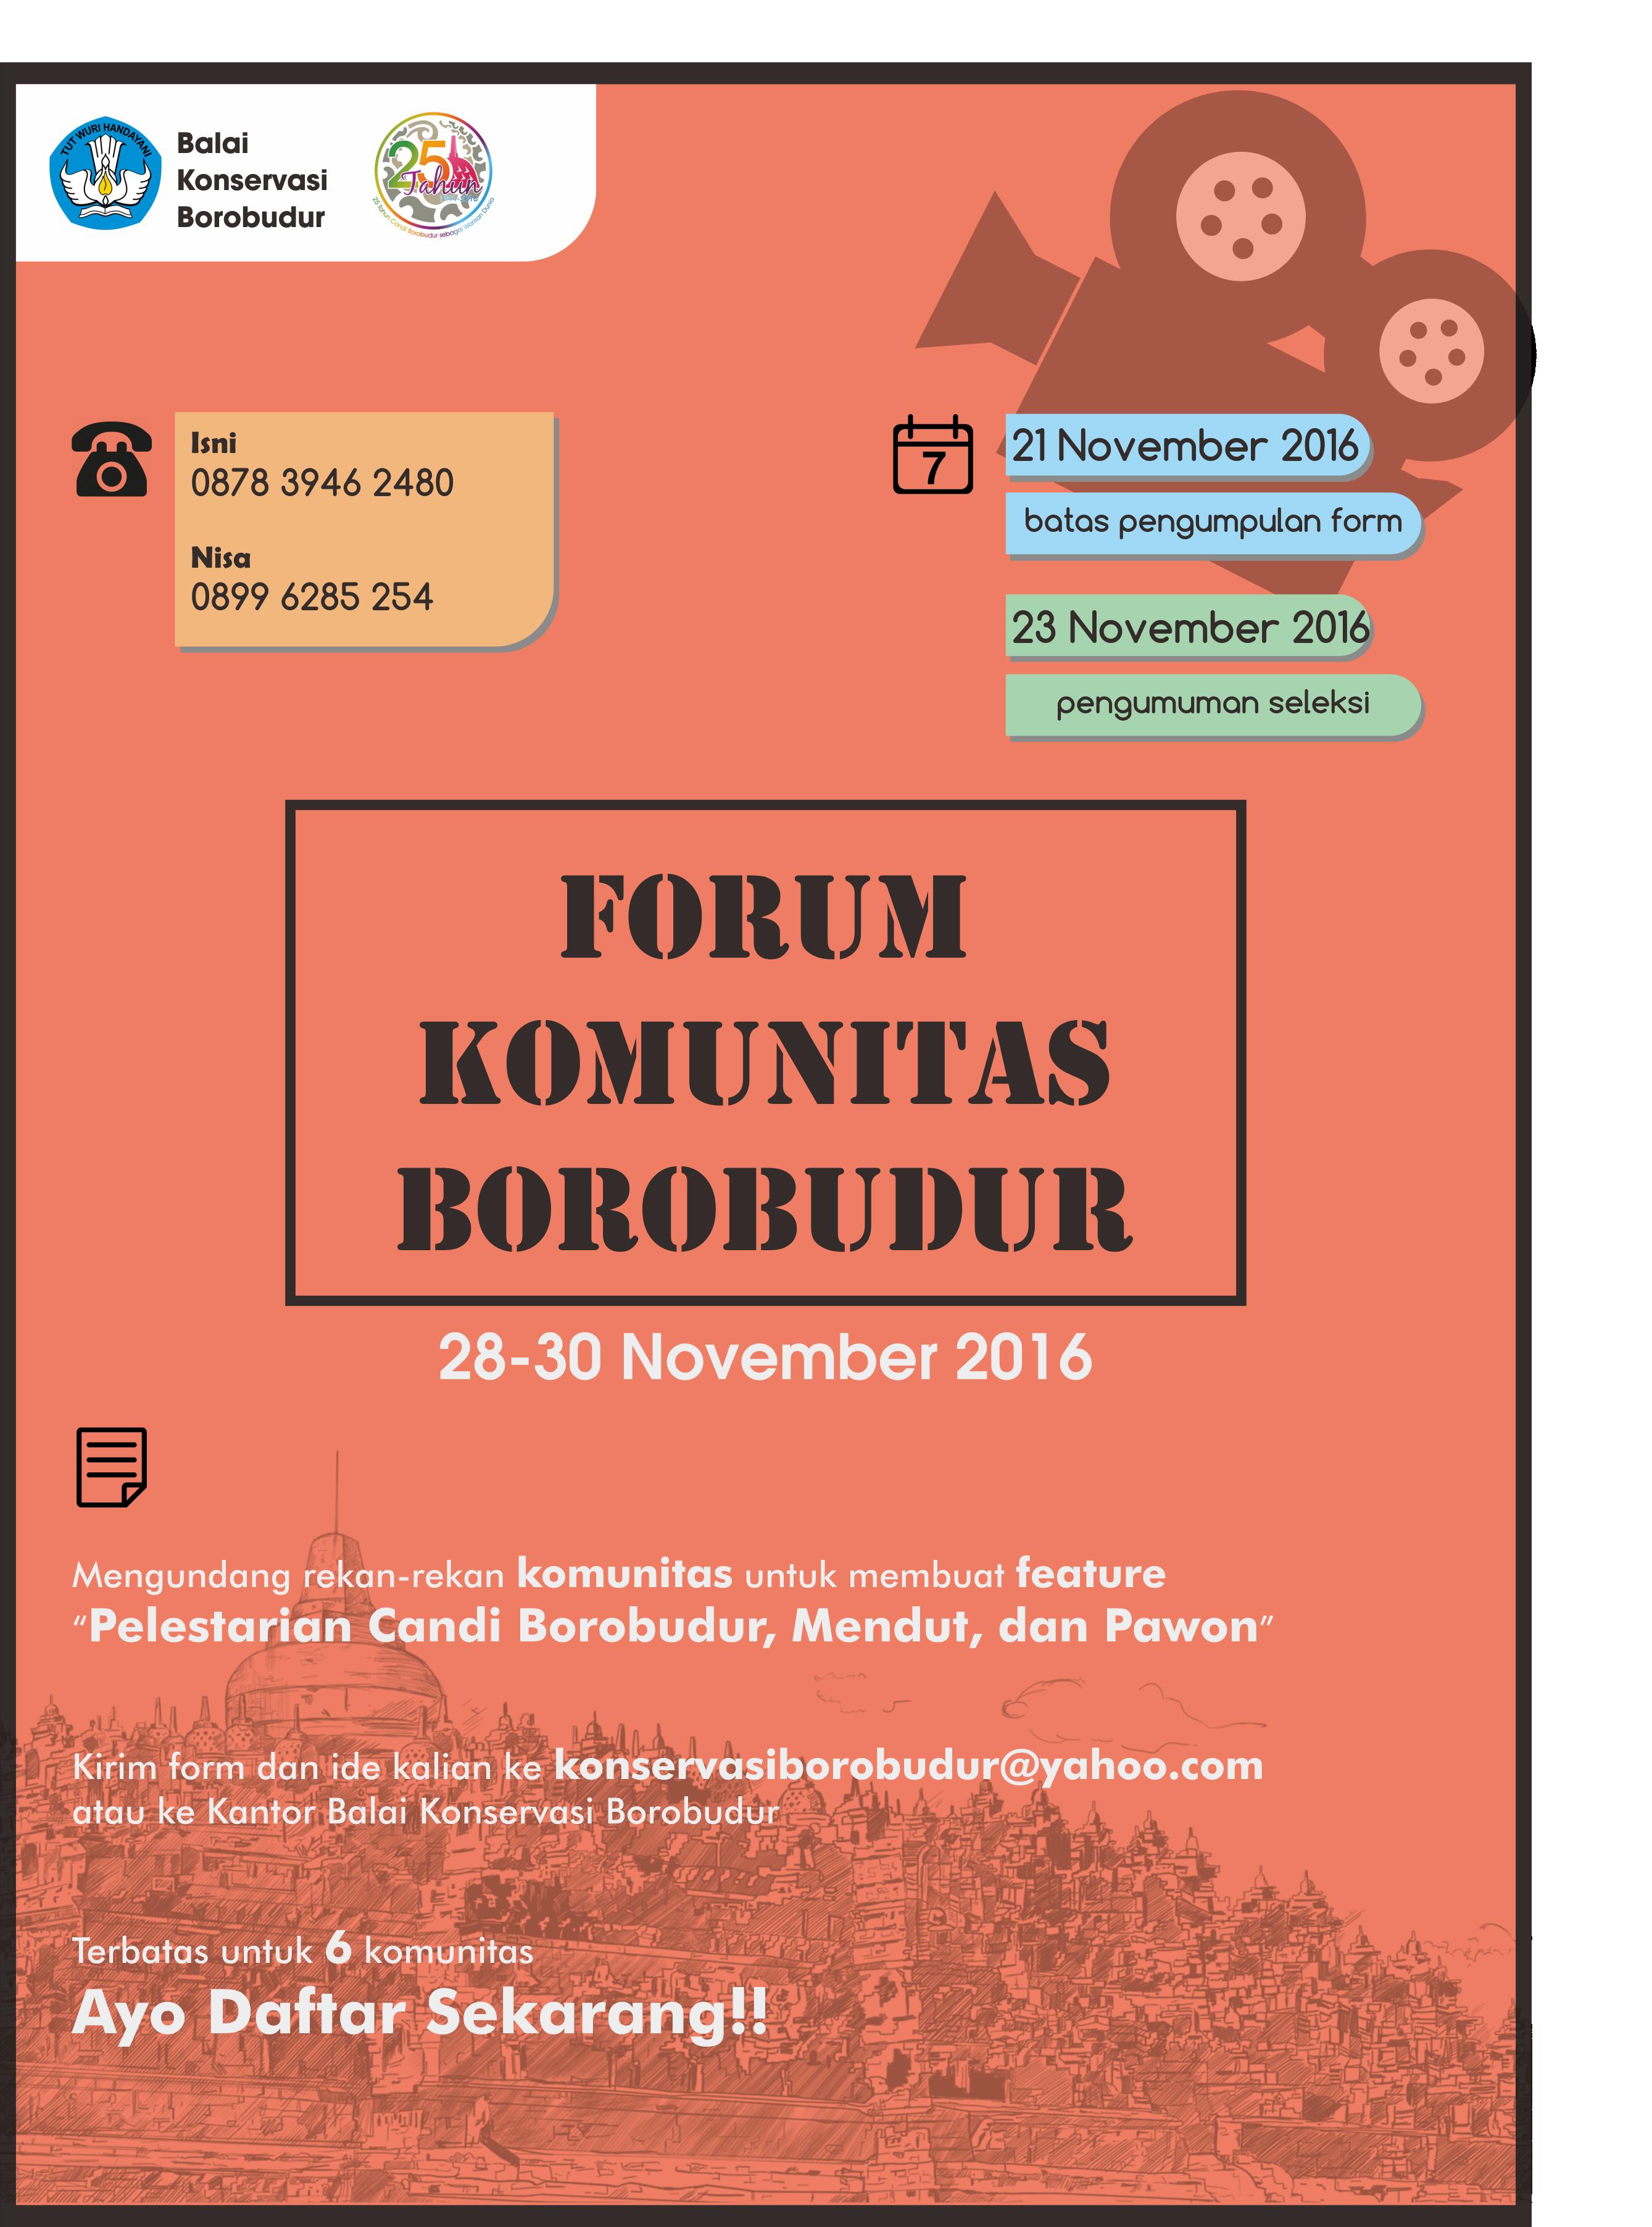 FORUM KOMUNITAS BOROBUDUR 2016